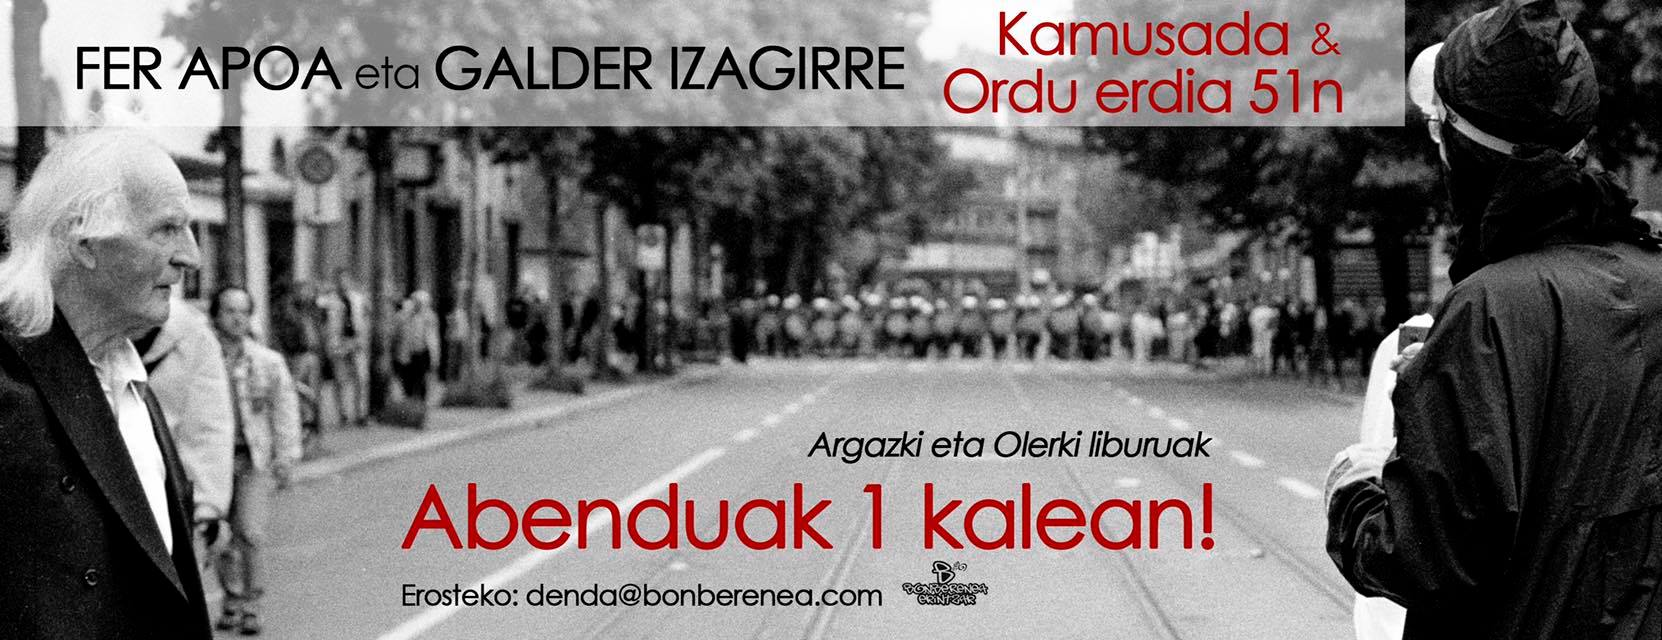 kamusadaordueredia-51n-banner